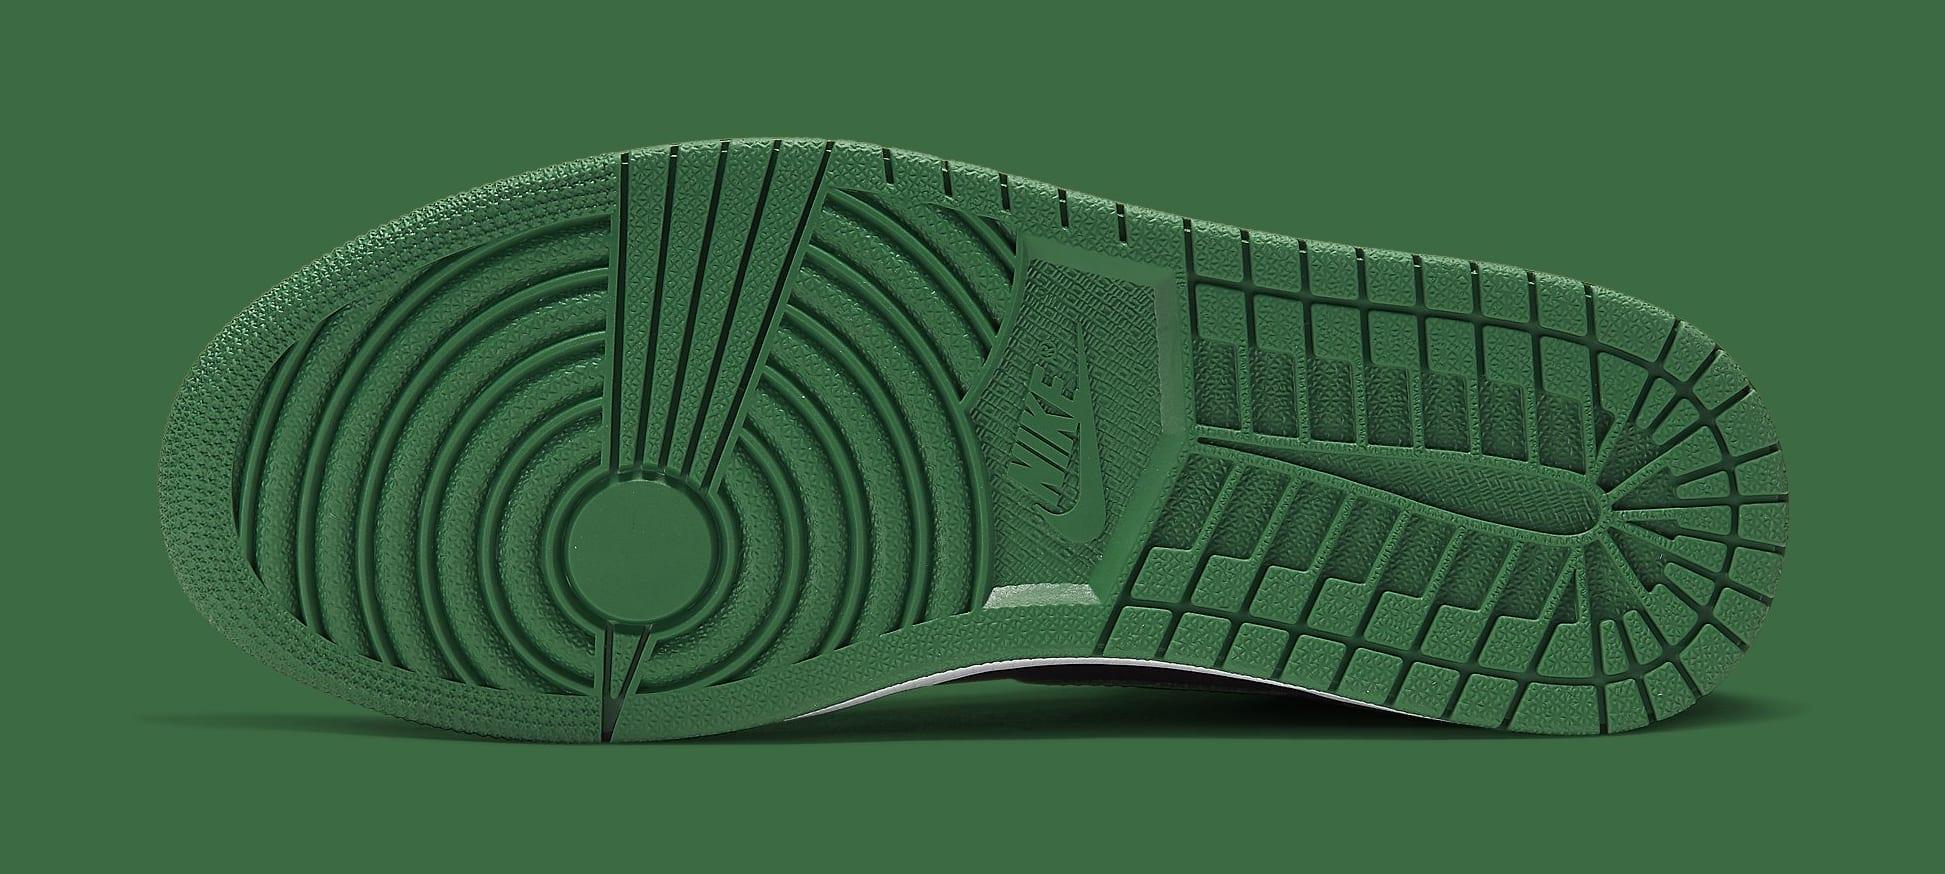 air-jordan-1-retro-high-og-pine-green-555088-030-outsole